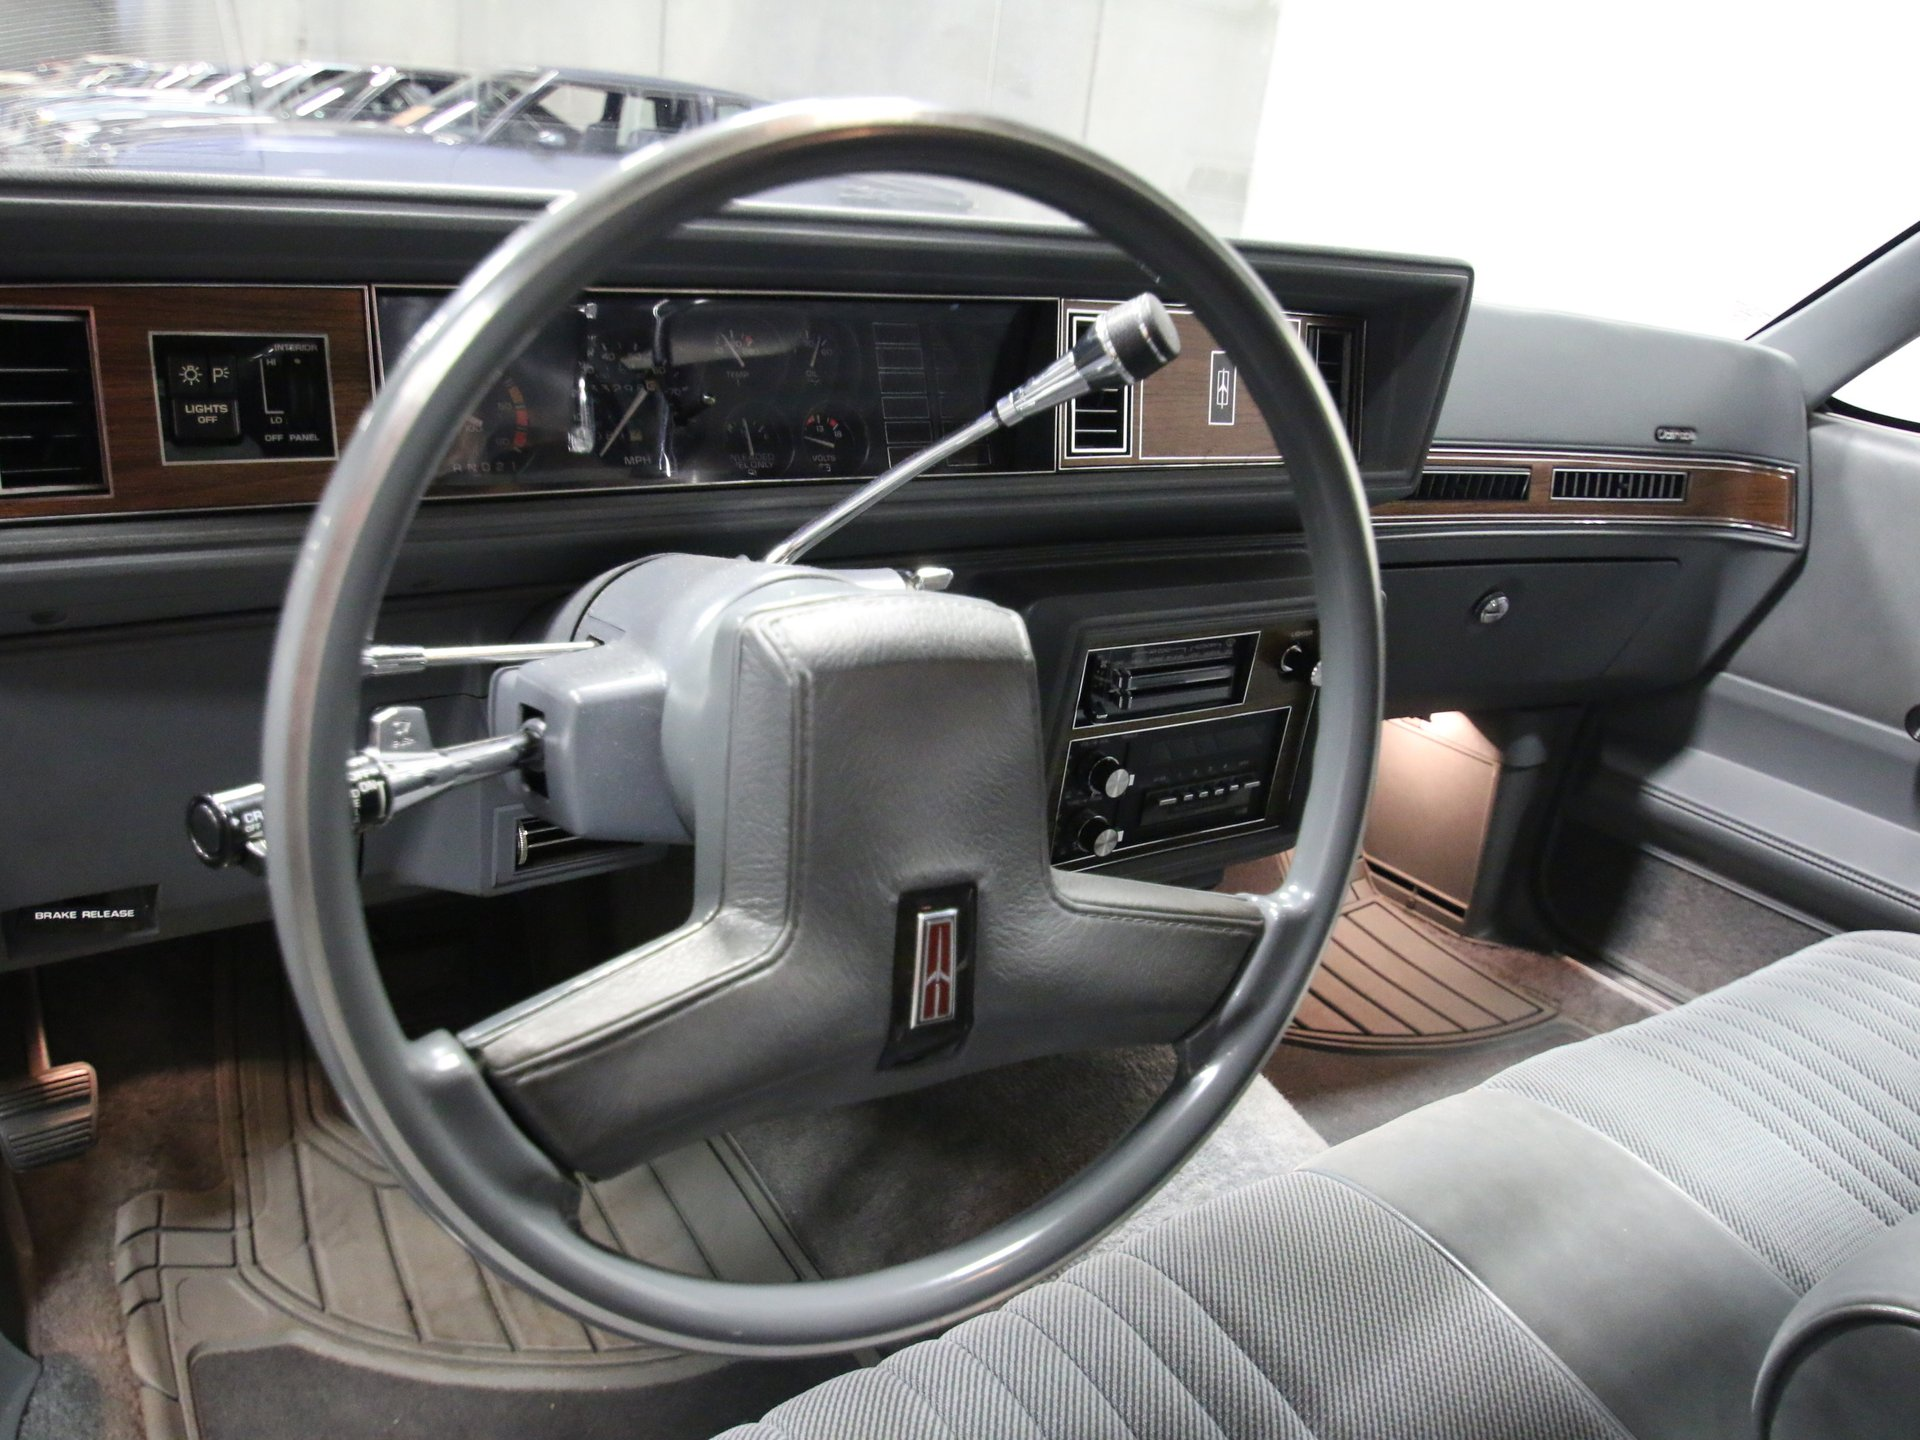 1986 Oldsmobile Cutlass | Streetside Classics - The Nation's